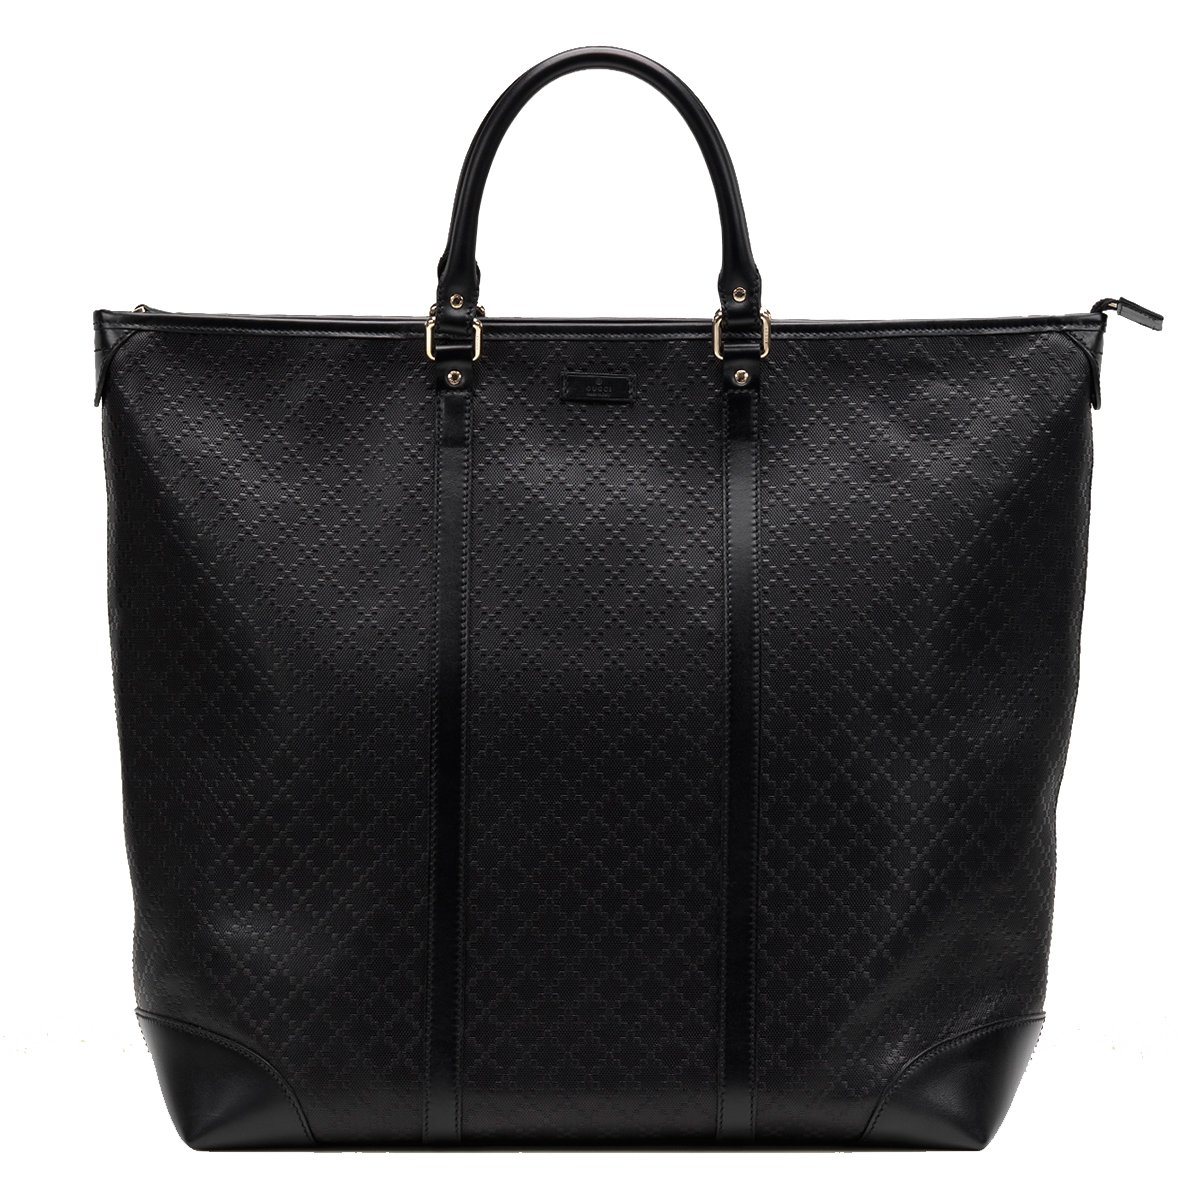 46100b2c5896 Gucci Diamante Leather Large Zip Top Unisex Tote Bag 308896, Black Model  Number: 308896AIZ1G1000 Black diamante pattern leather, unisex structured tote  bag